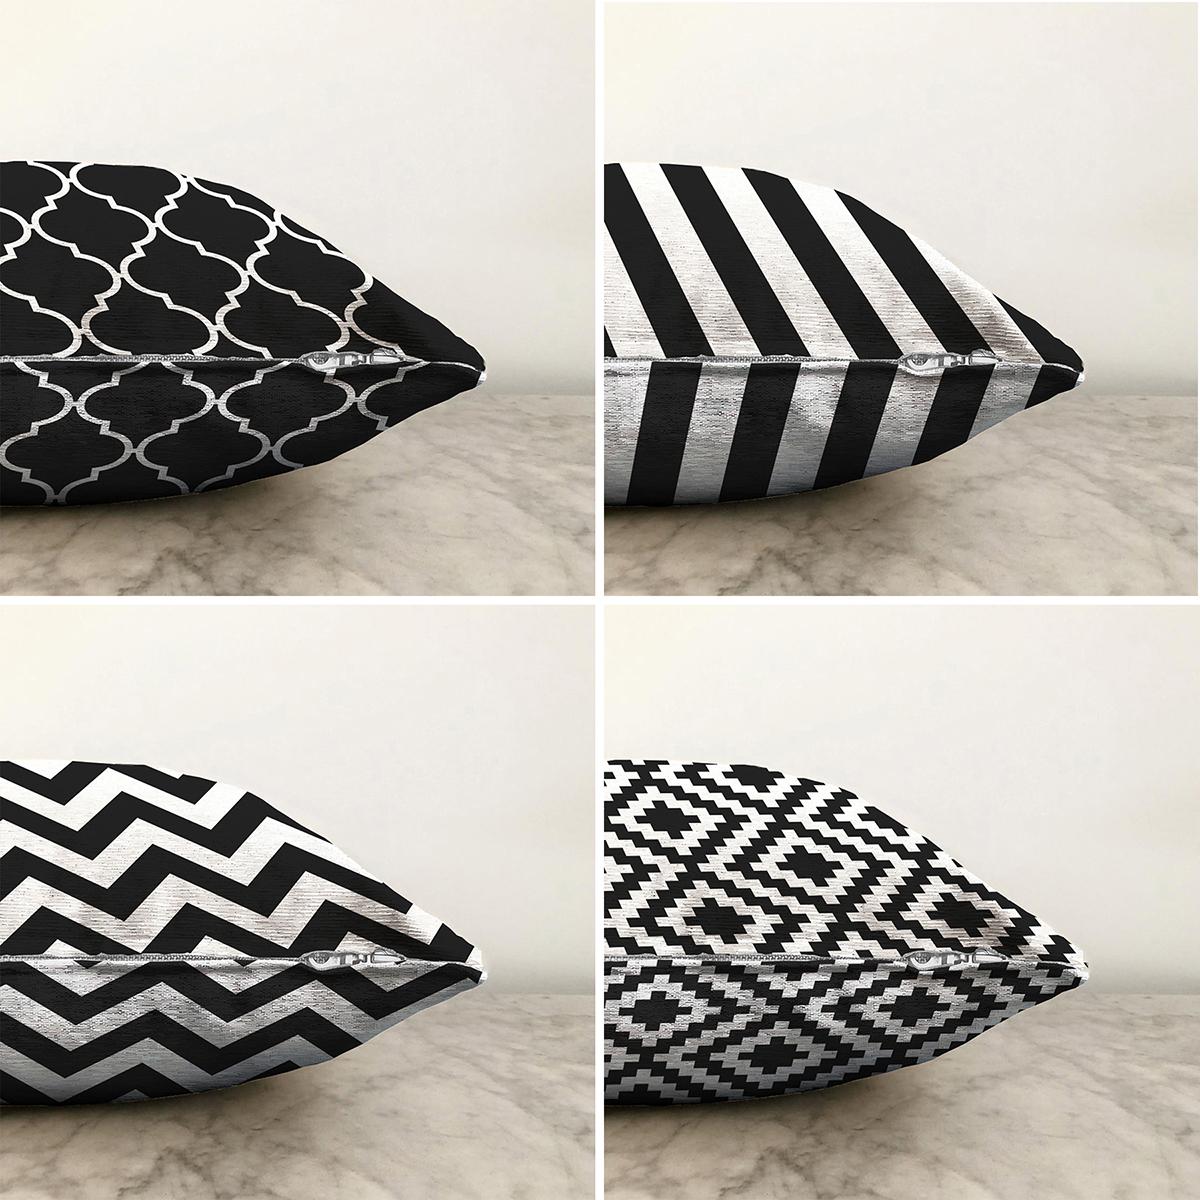 Realhomes Çift Taraflı Siyah Beyaz Geometrik Şekiller 4'lü Şönil Yastık Kırlent Kılıf Seti - 55 x 55 cm Realhomes